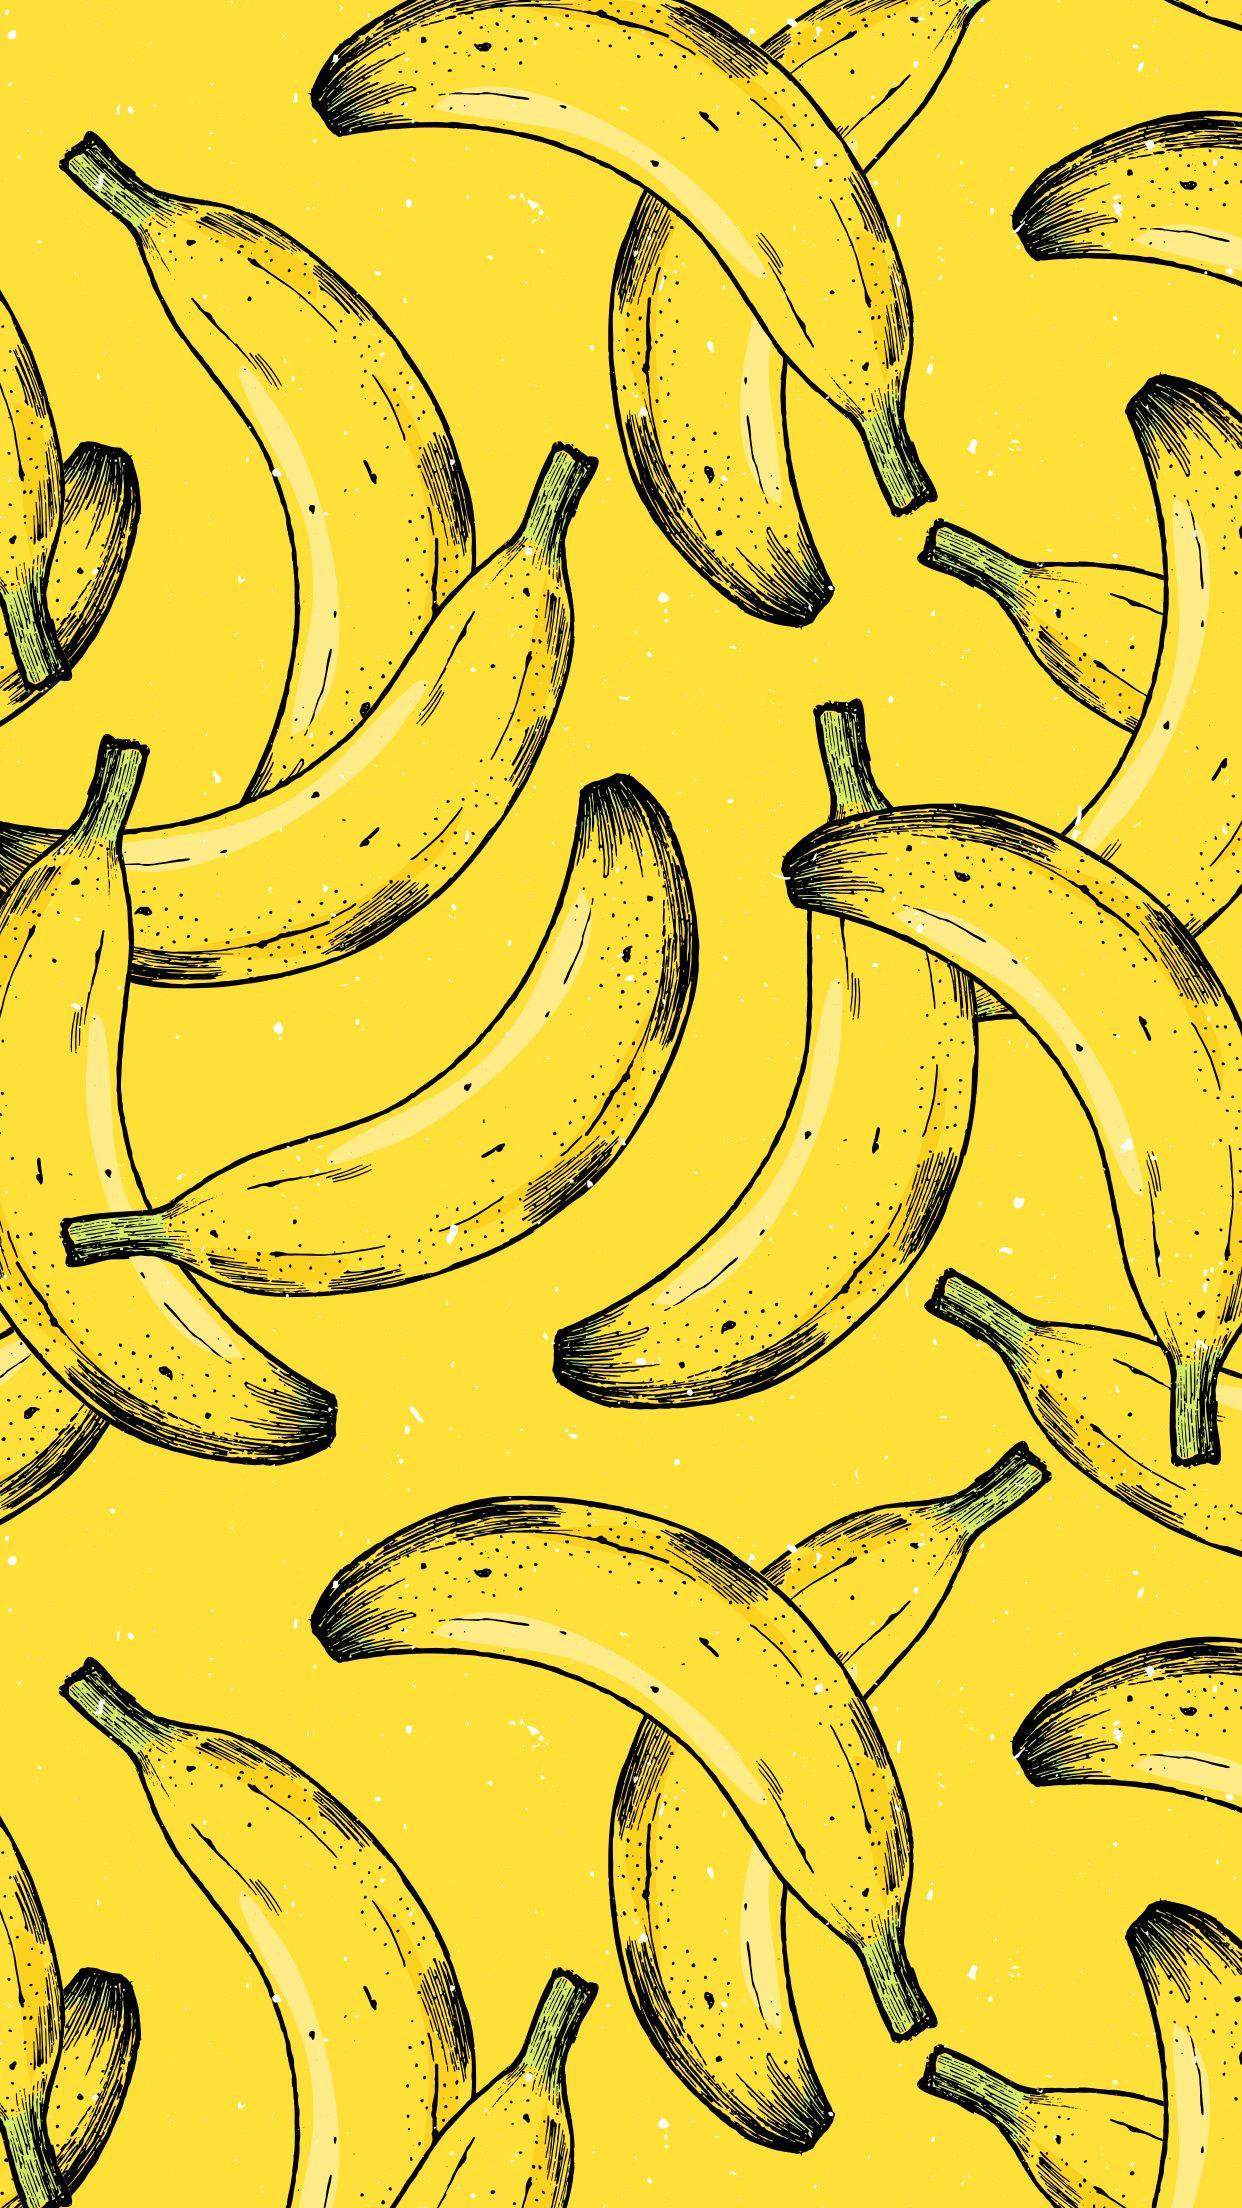 Banana Iphone Iphonewallpaper Yellow Hdwallpaper Padroes De